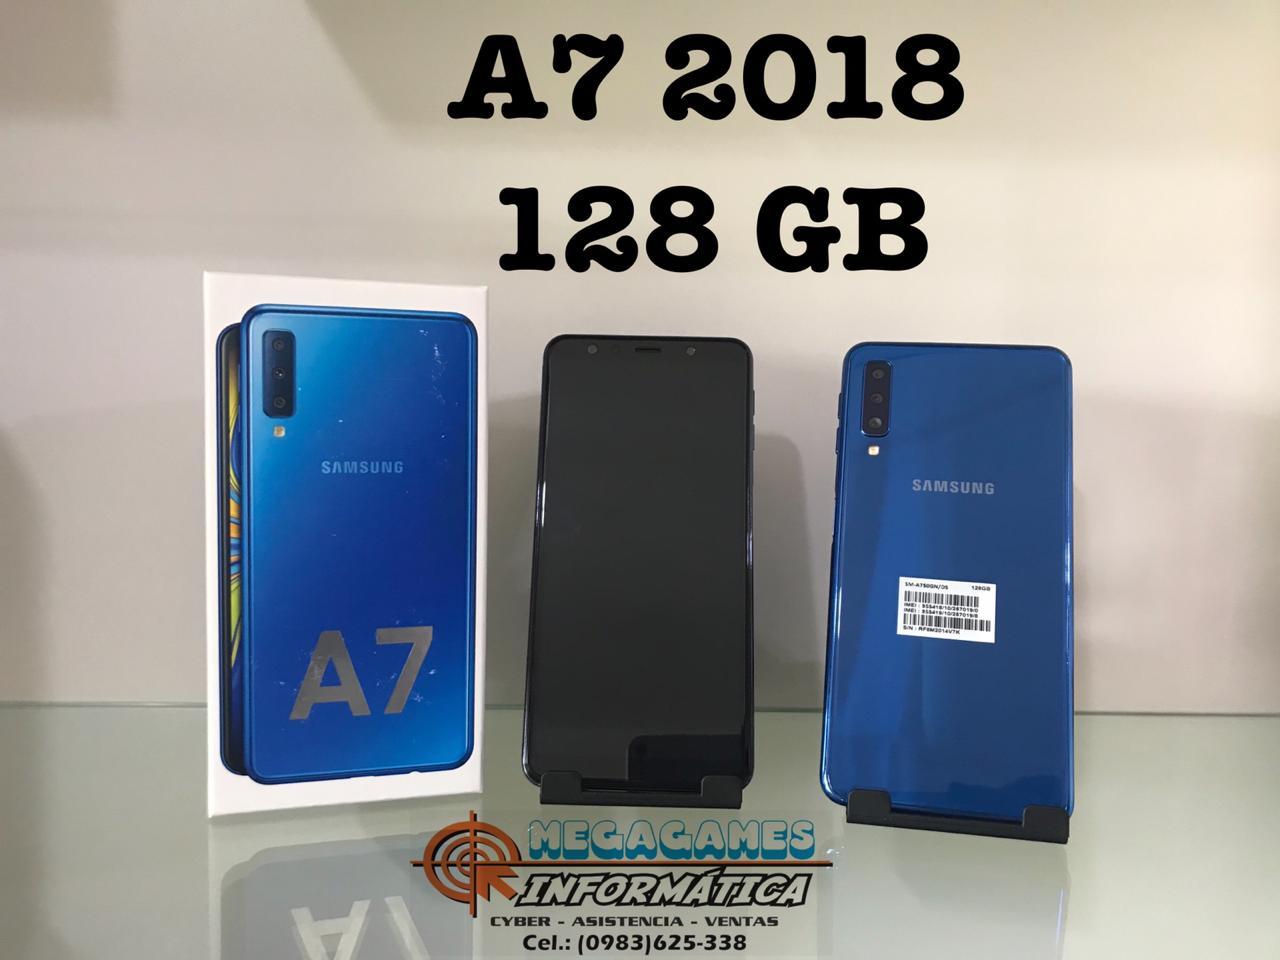 A7 2018